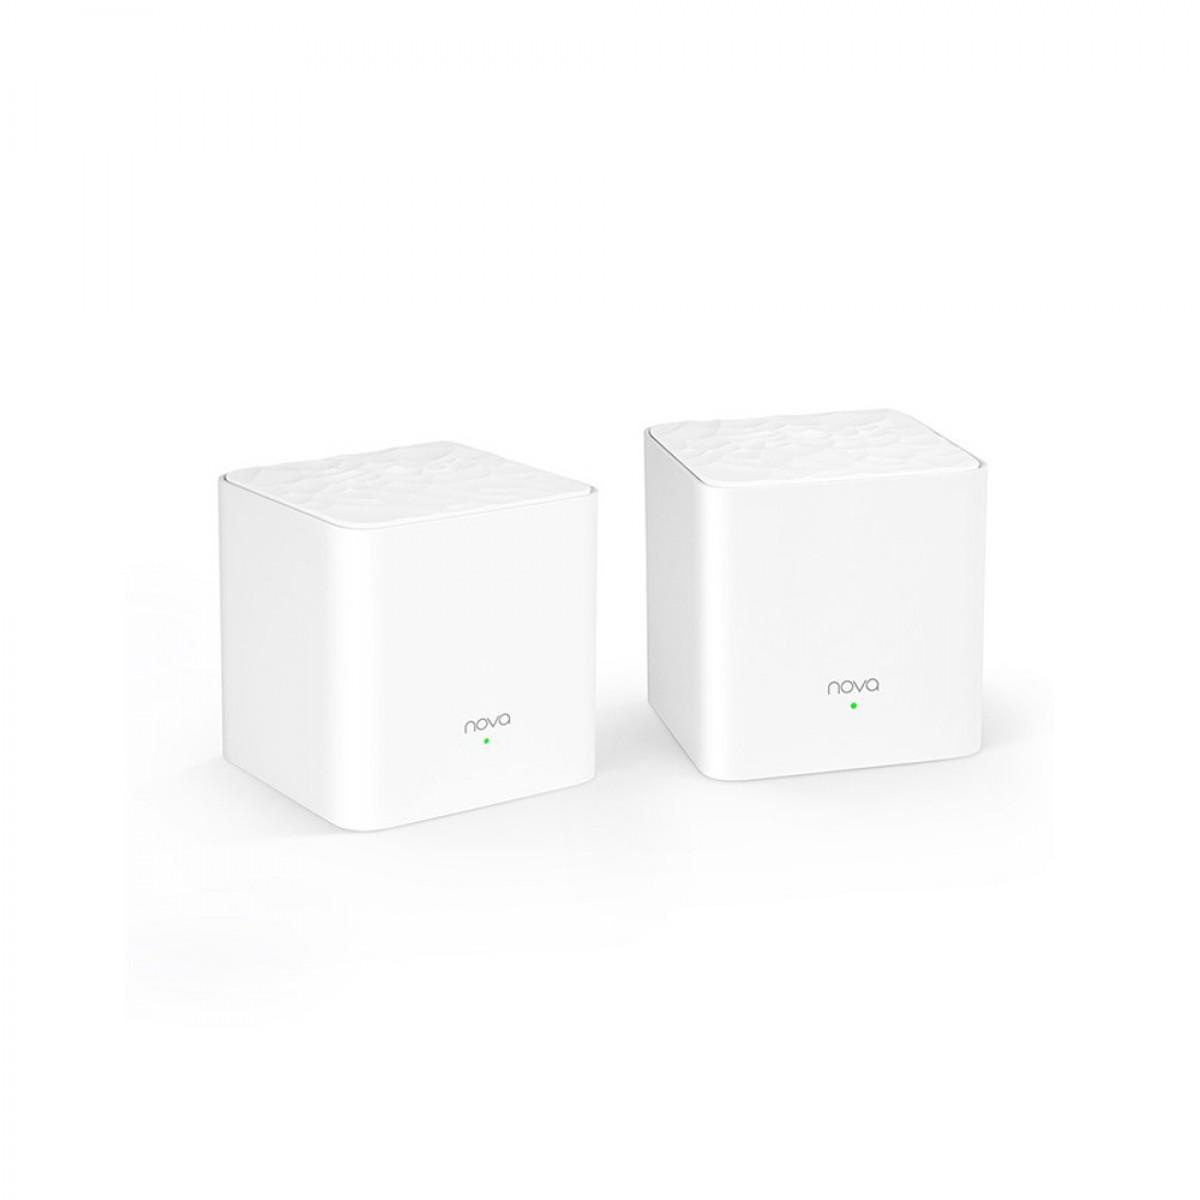 Tenda MW3(2-Pack) AC1200 Whole Home Mesh WiFi System - VEVE